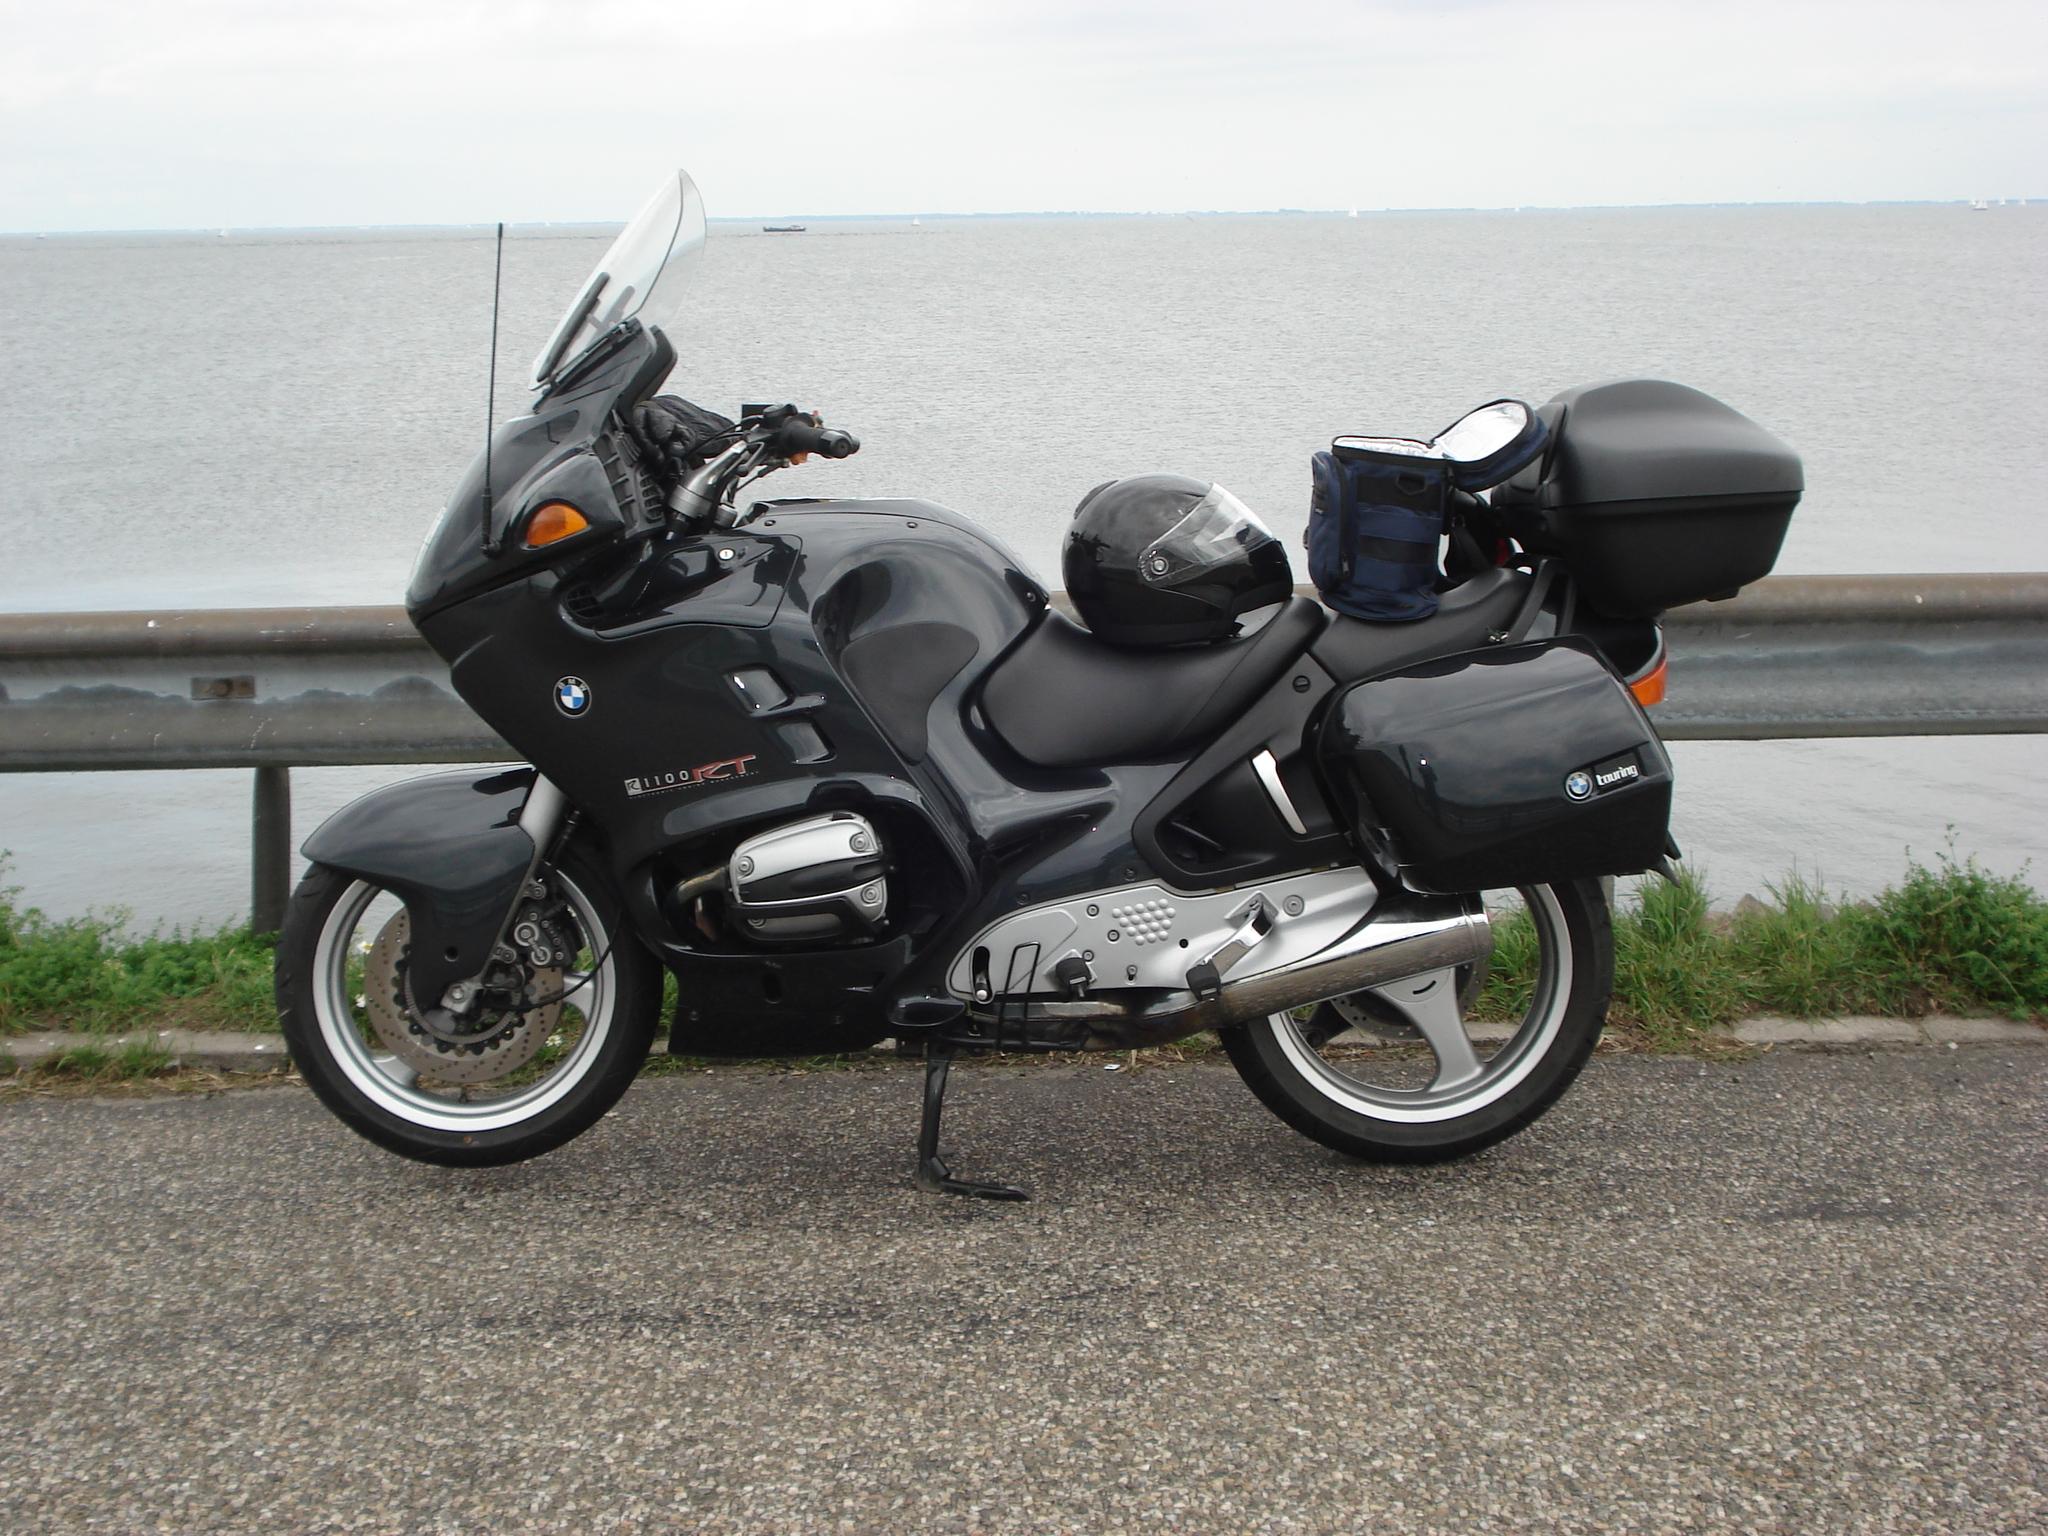 BMW R1100-series